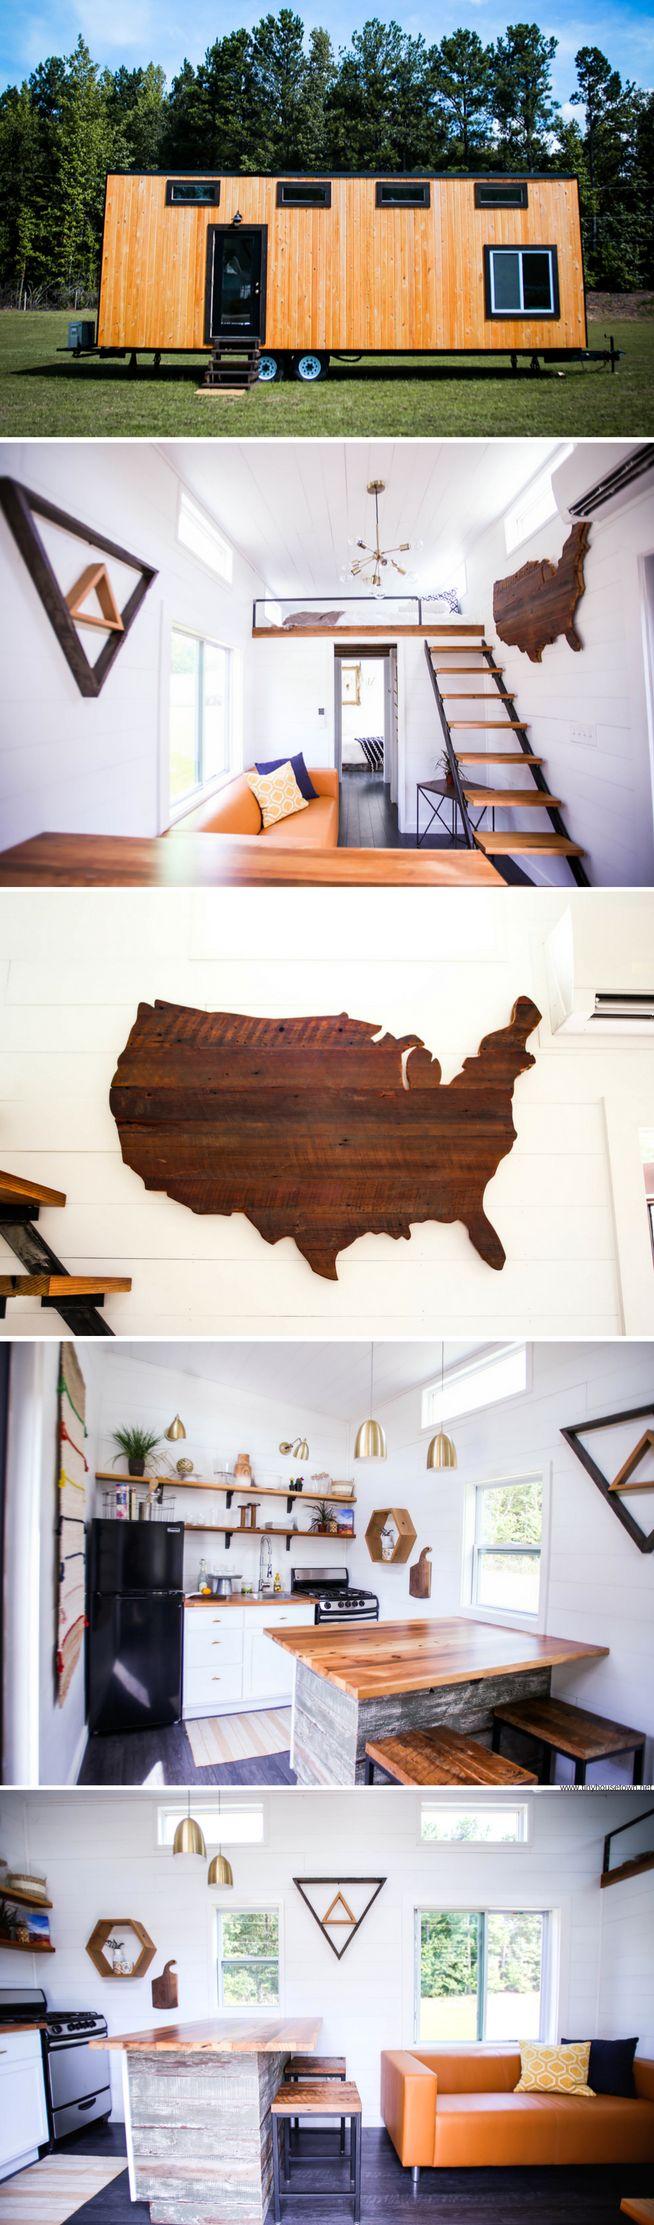 60 best Houses images on Pinterest